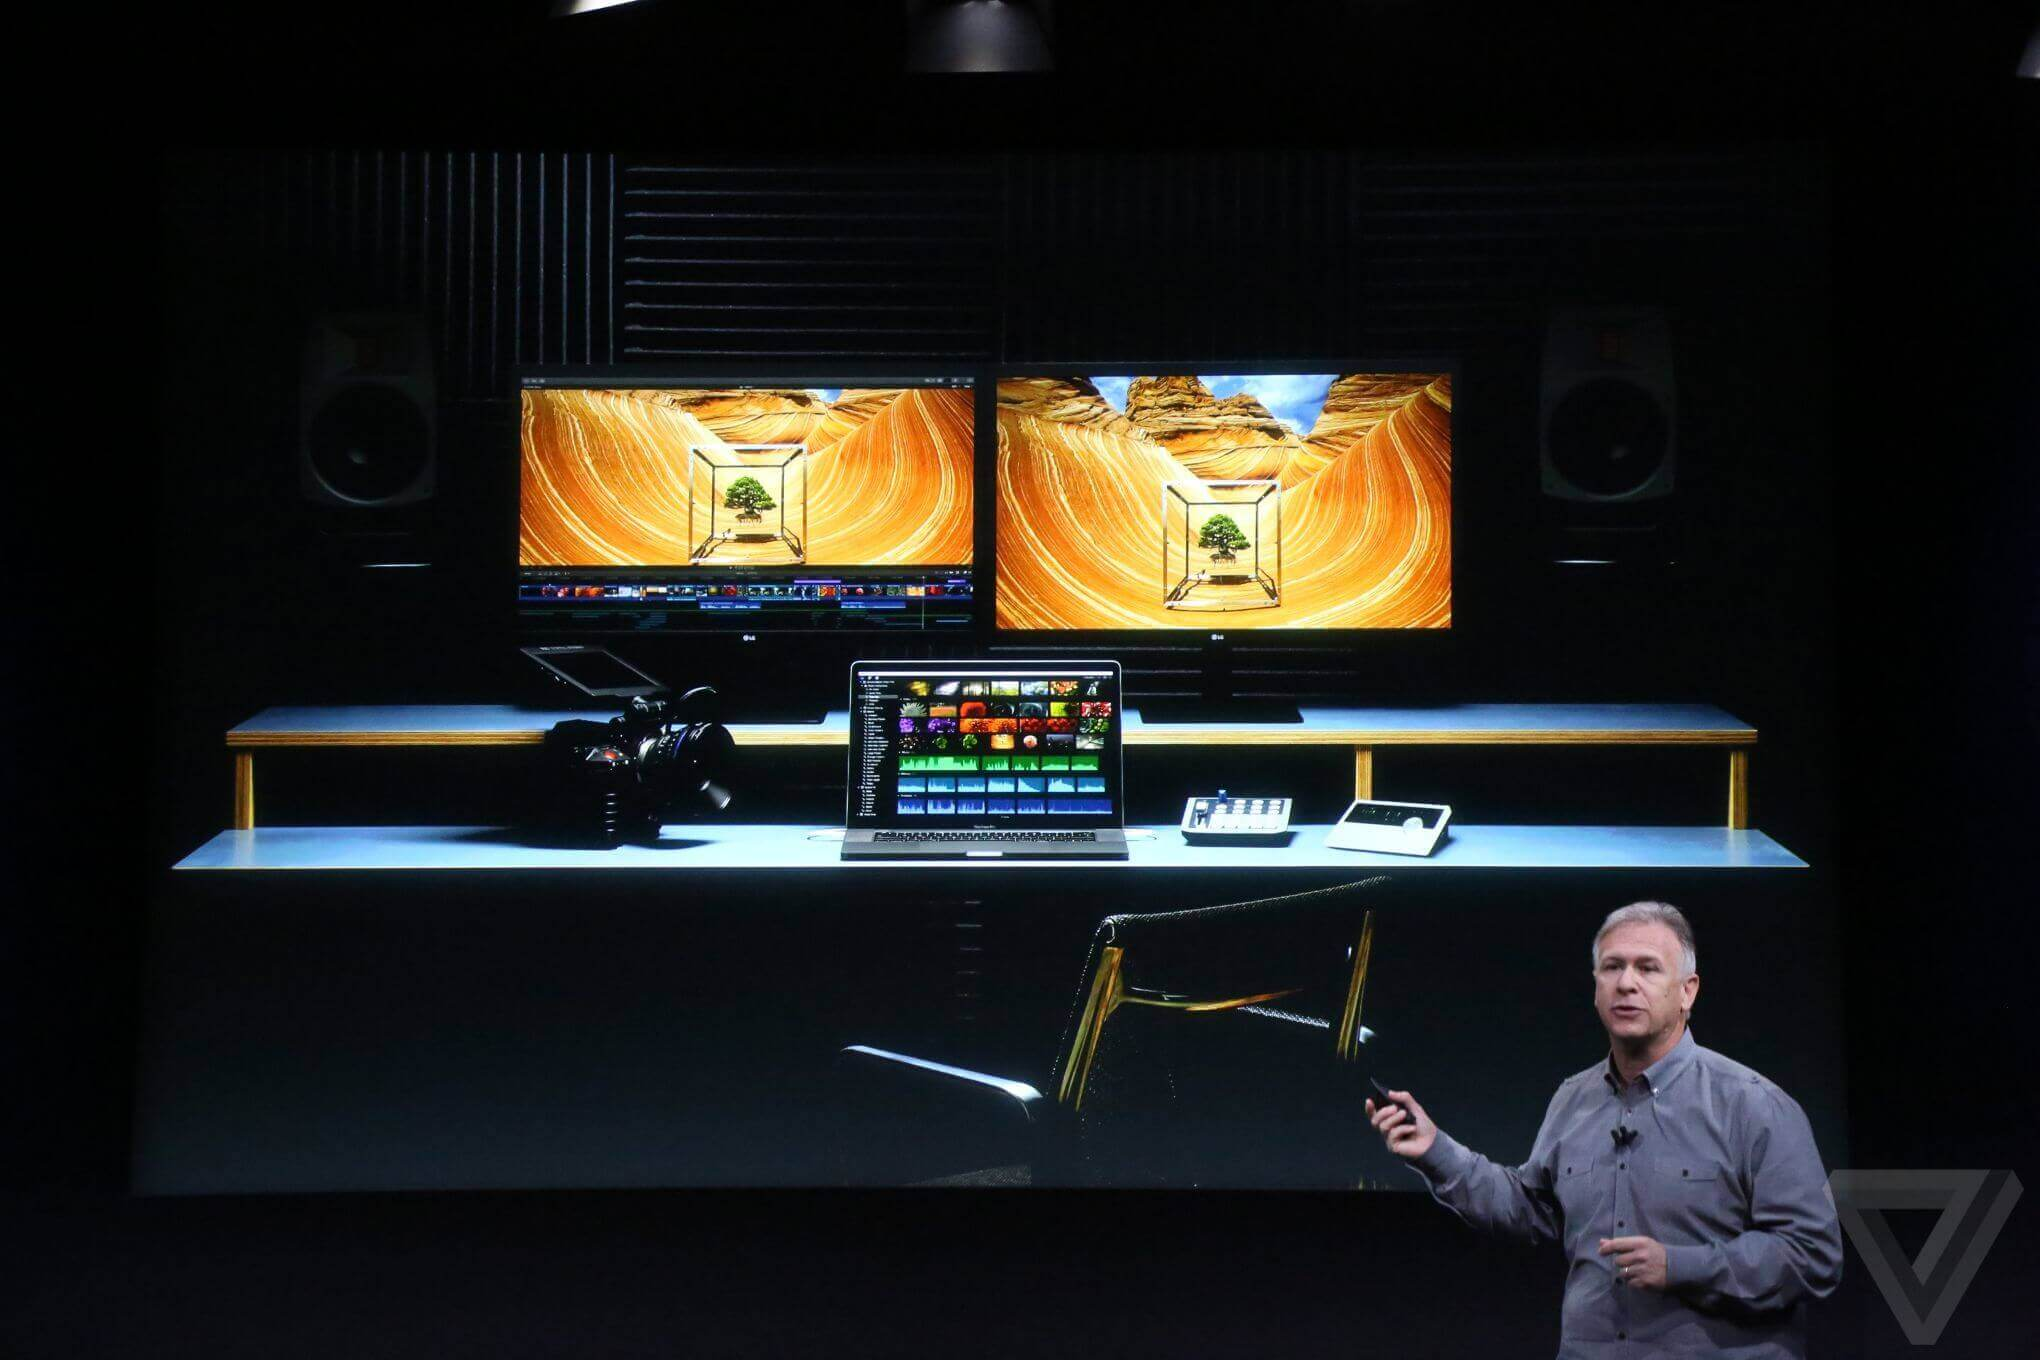 apple-macbook-lg